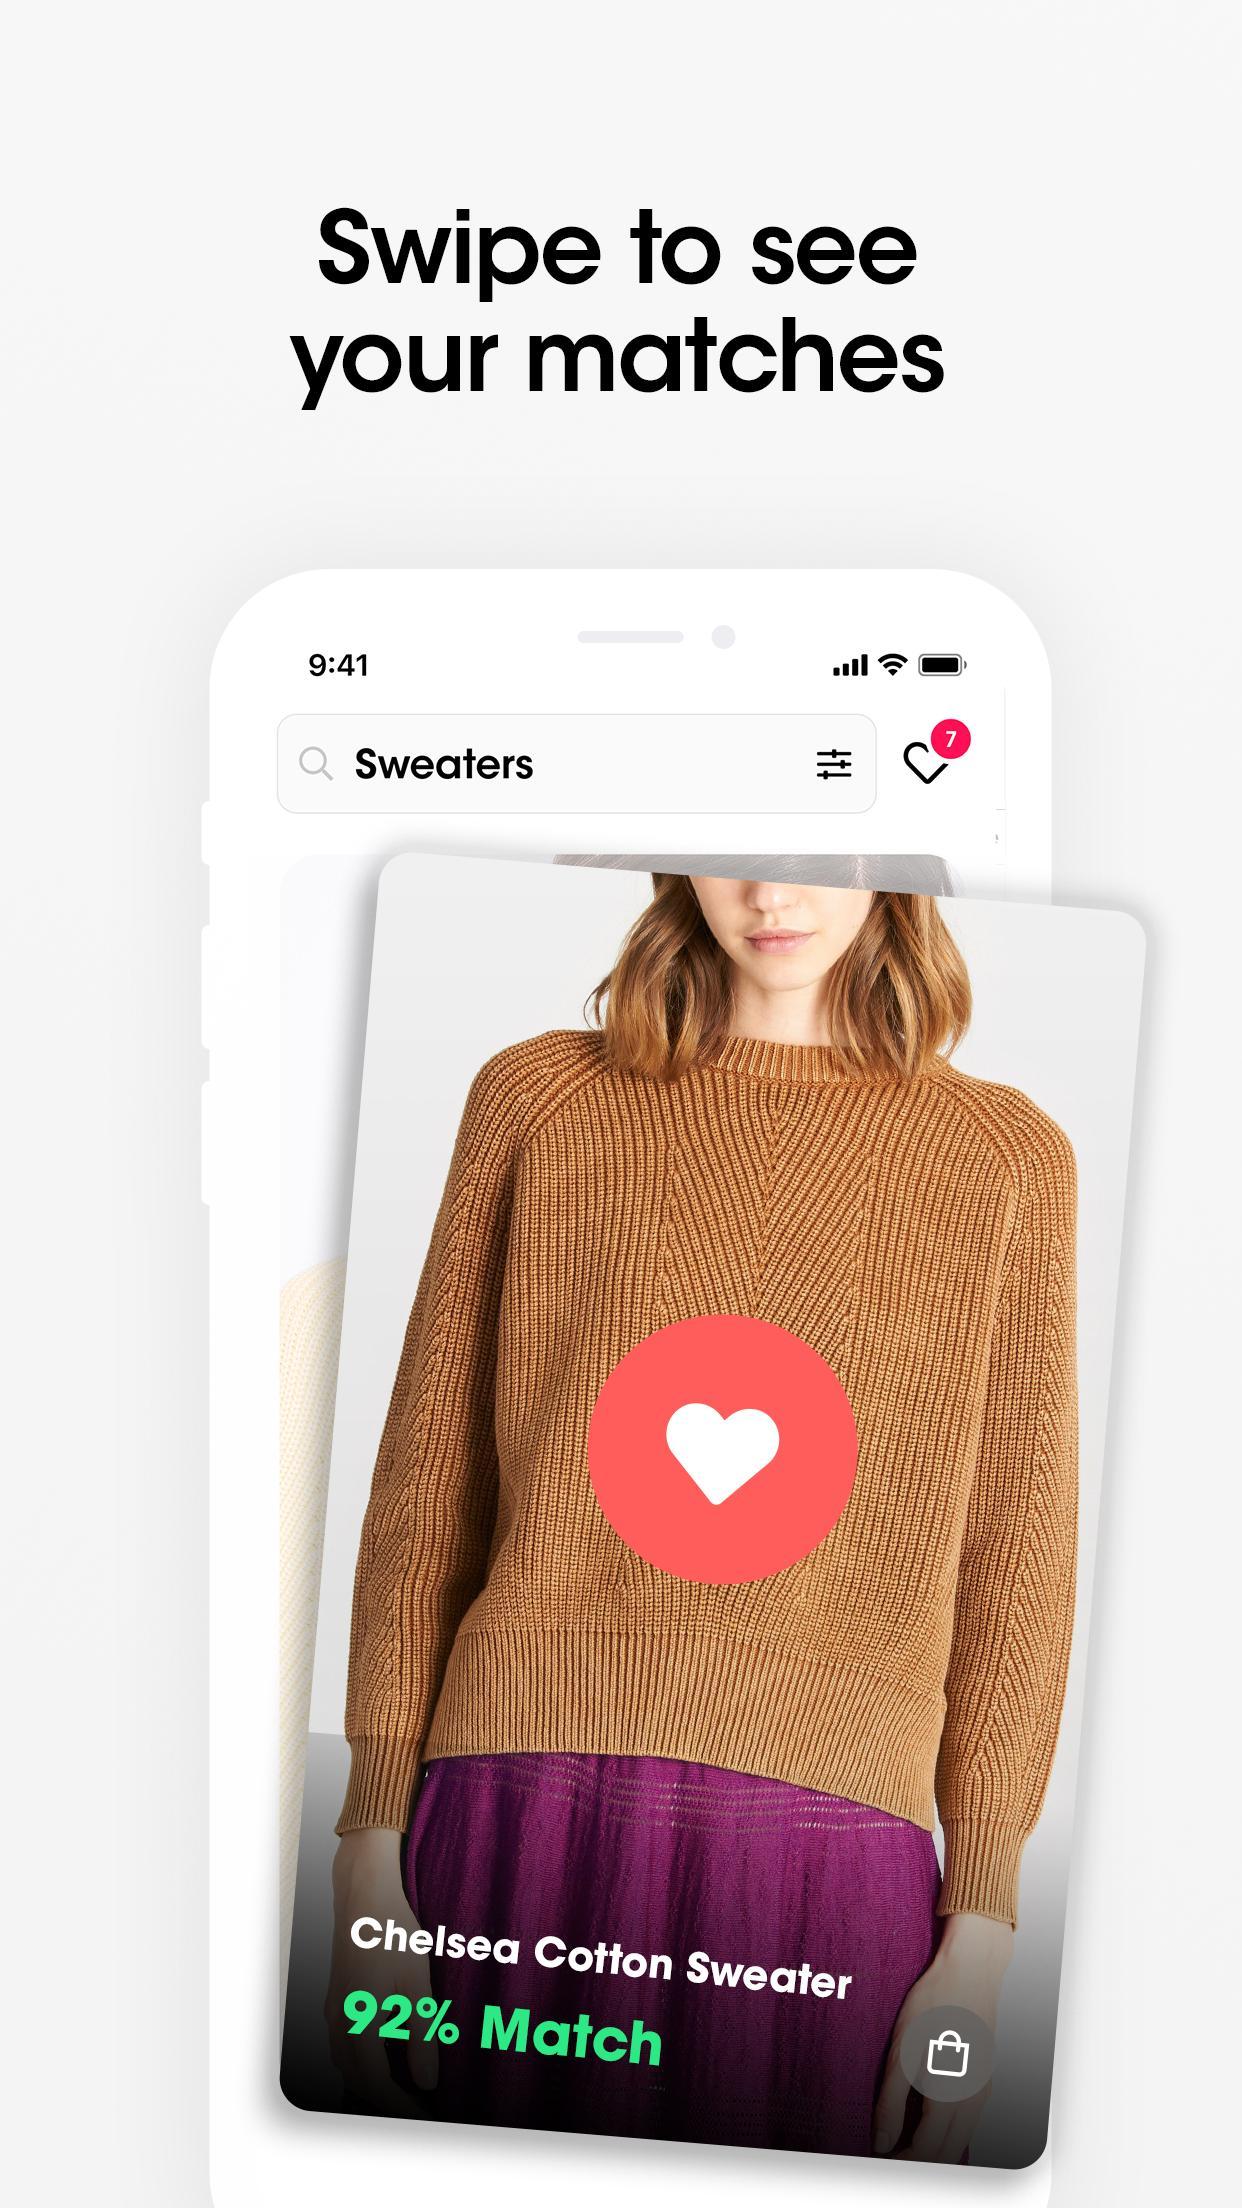 Autumn App - Fashion & Home Decor 1.16.0 Screenshot 3